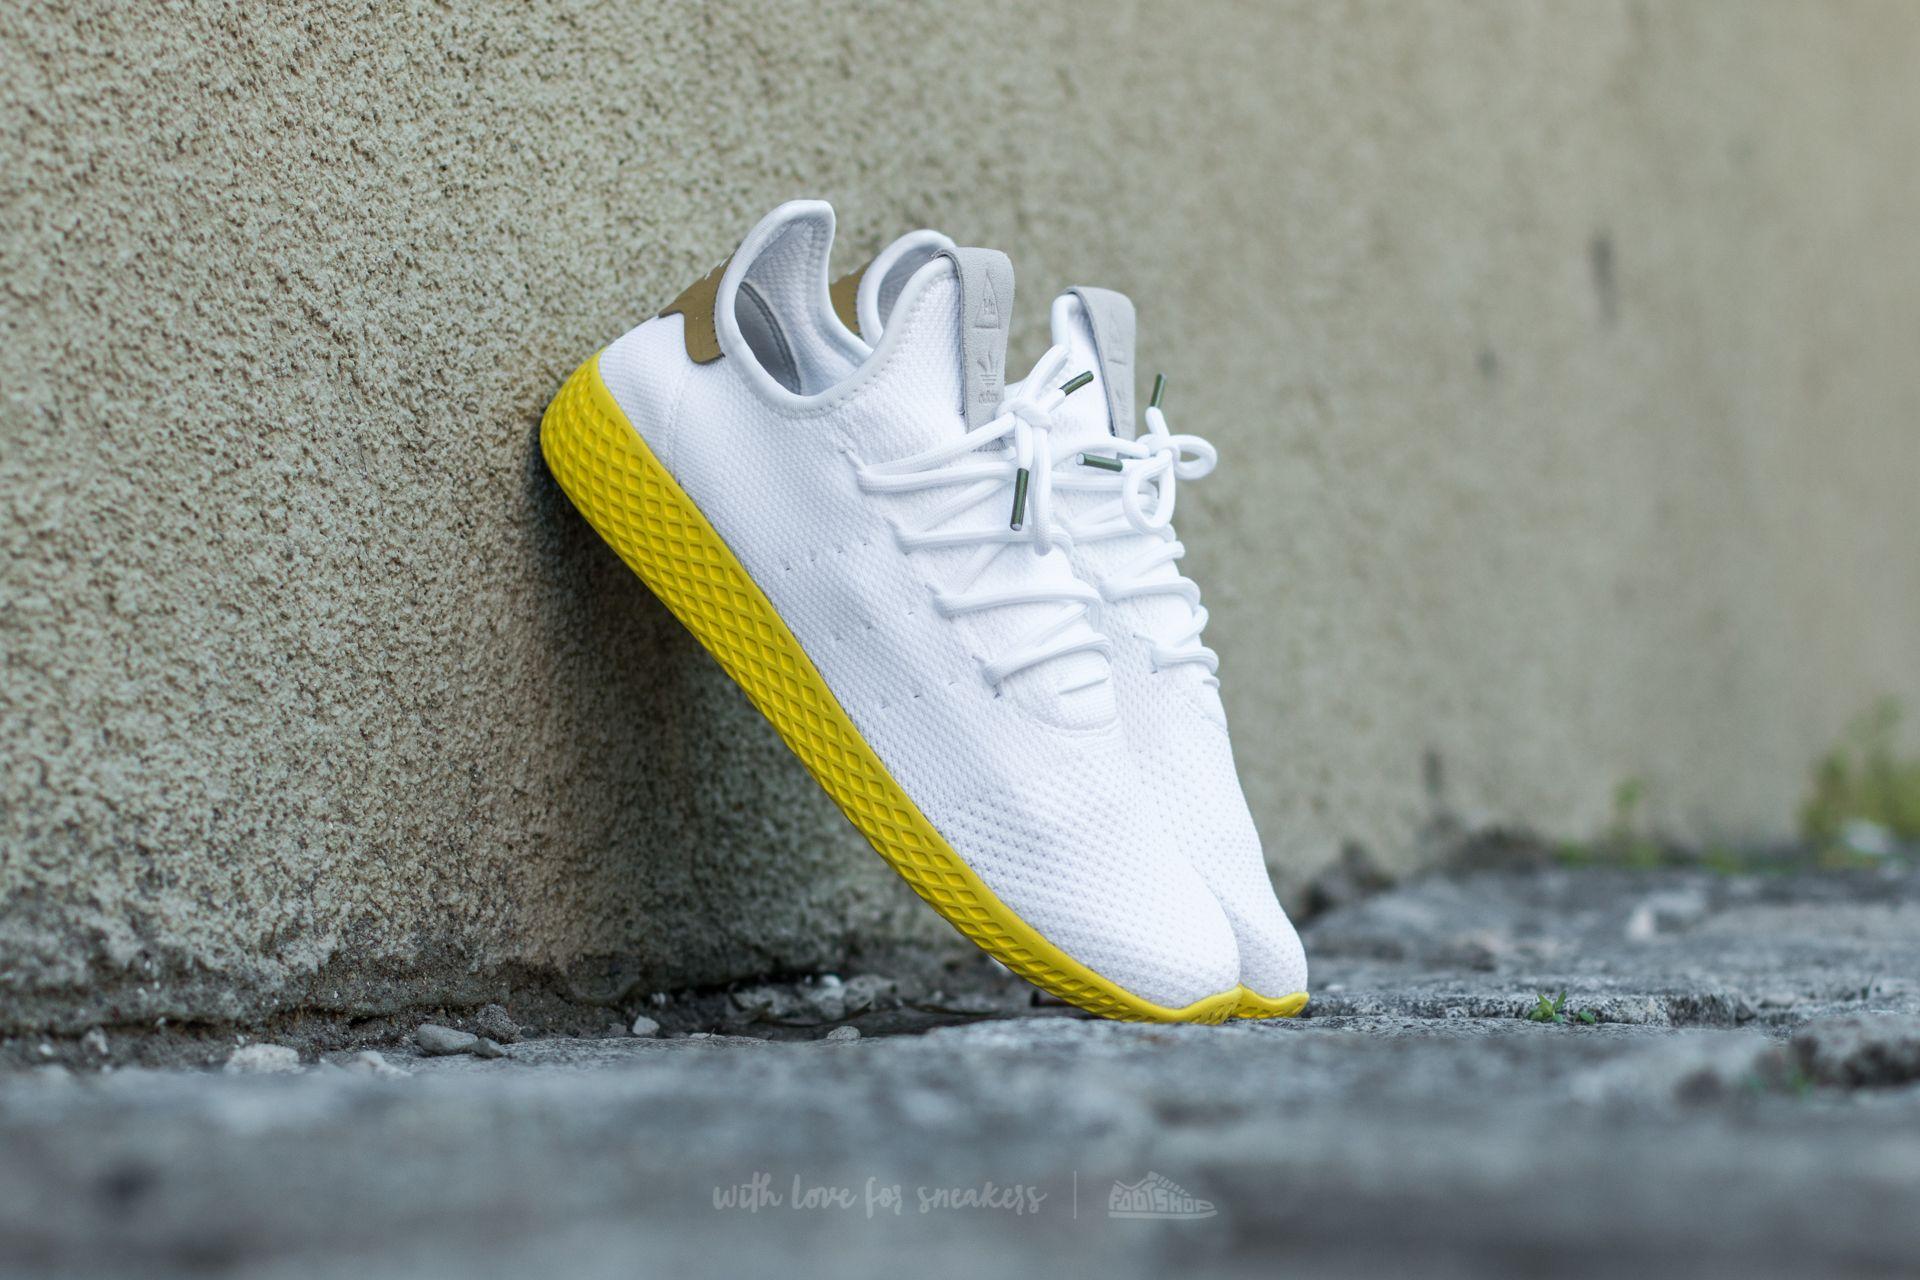 da3581142ff68 adidas x Pharrell Williams Tennis HU Ftw White  Ftw White  Yellow ...